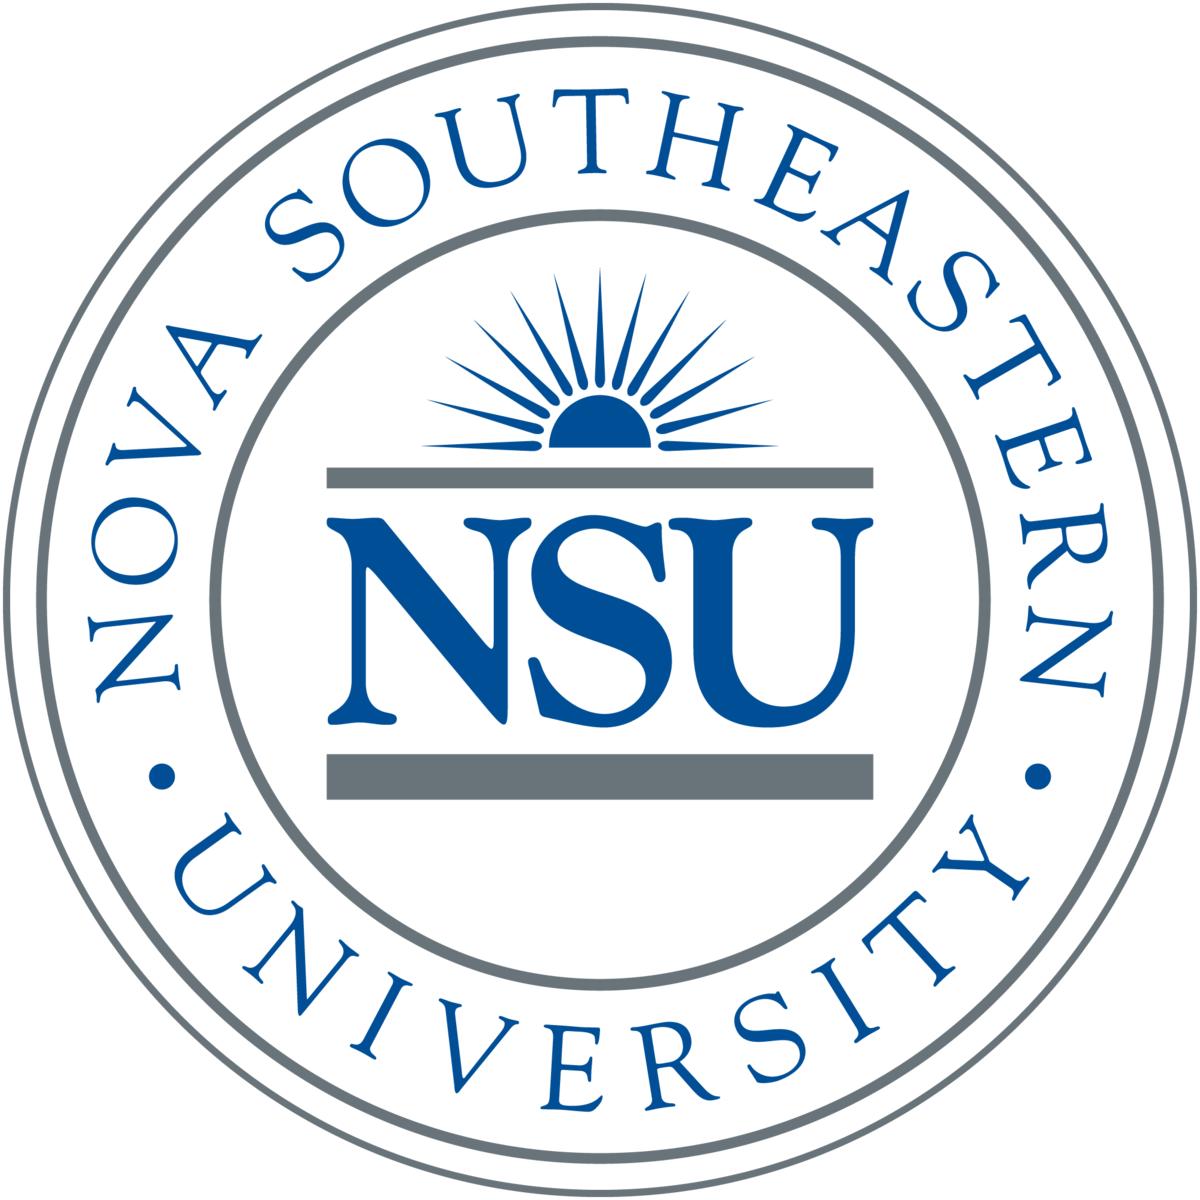 NOVA University - Employees and Students